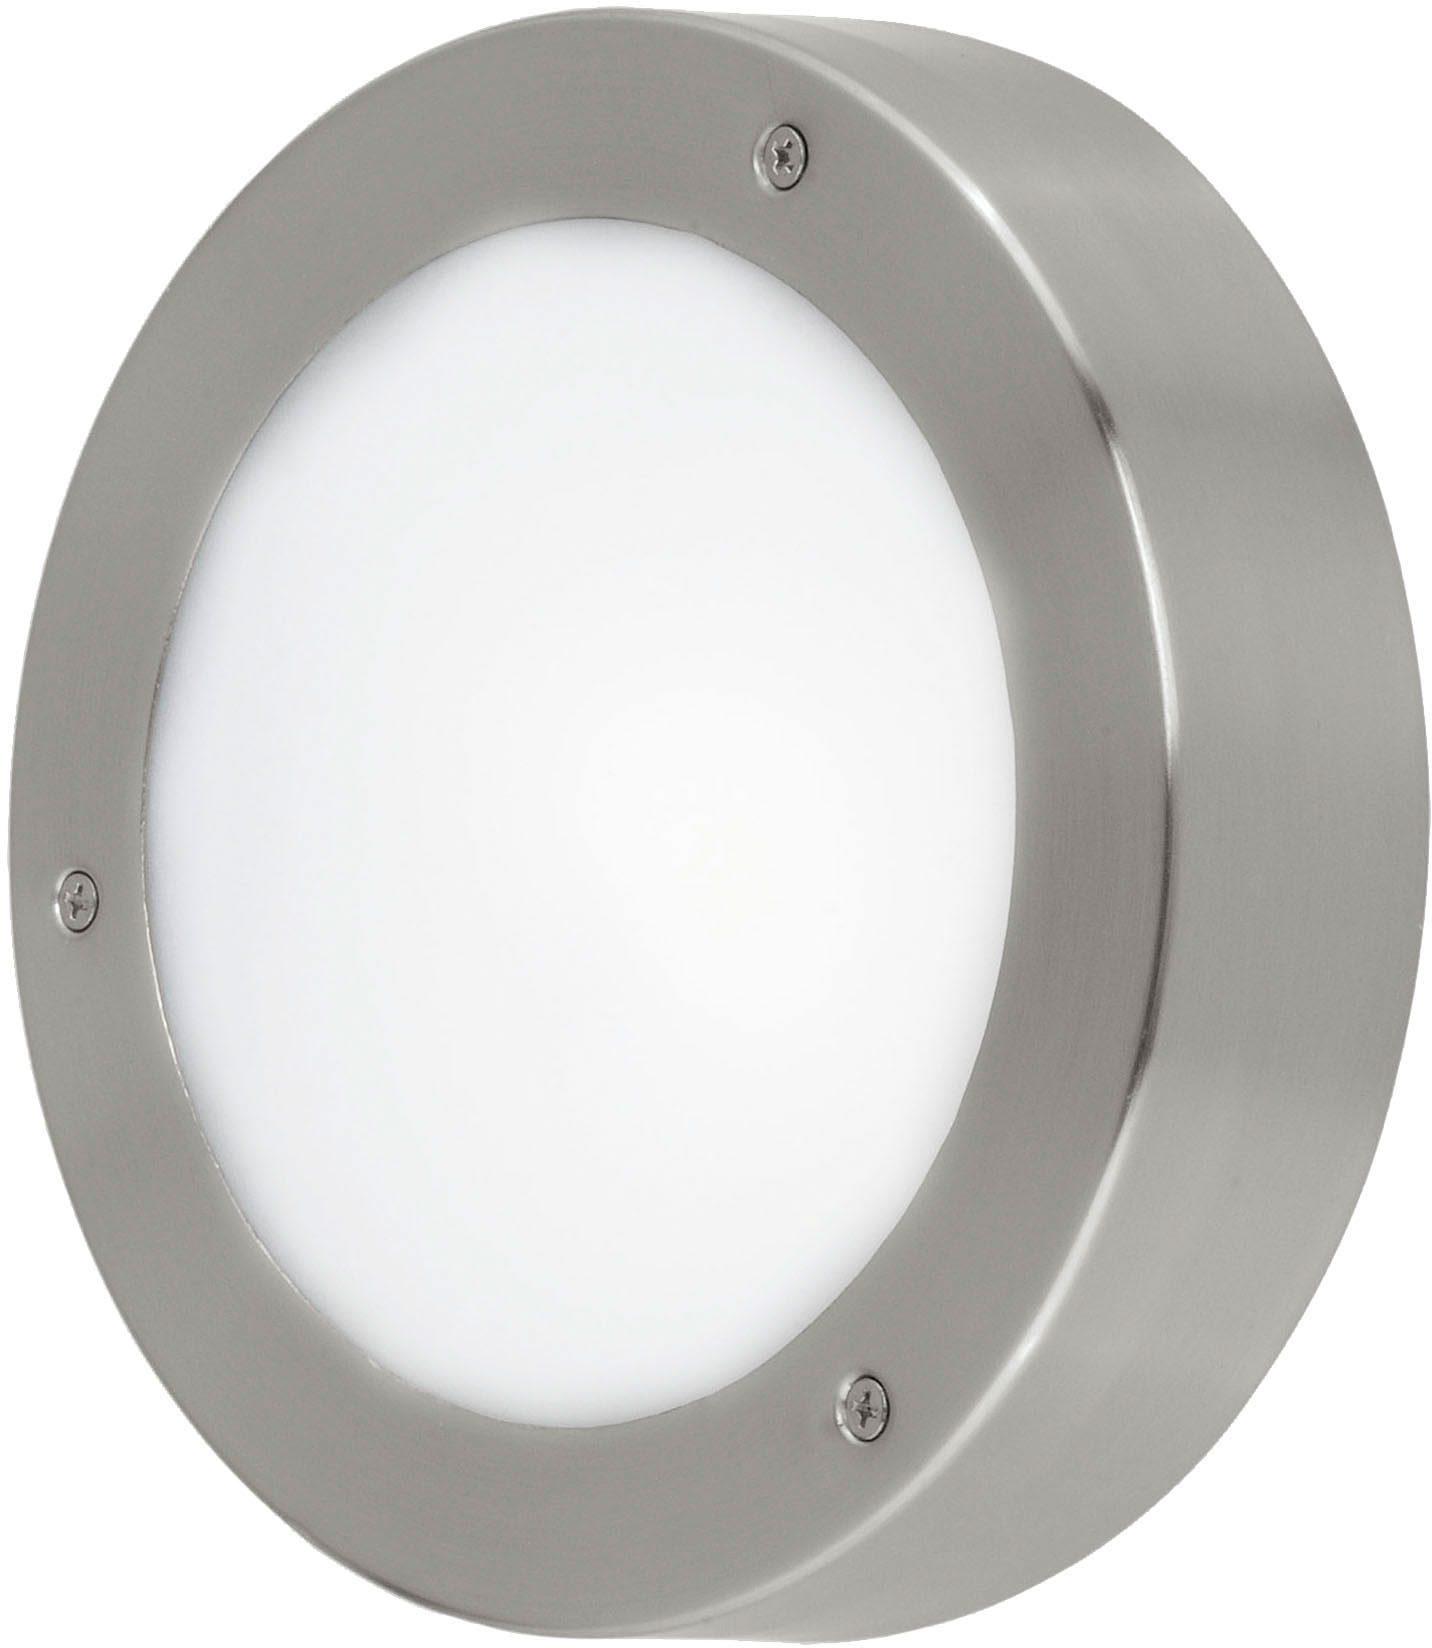 Eglo LED Außenleuchte, 1 flg., Wandleuchte, »Vento1«